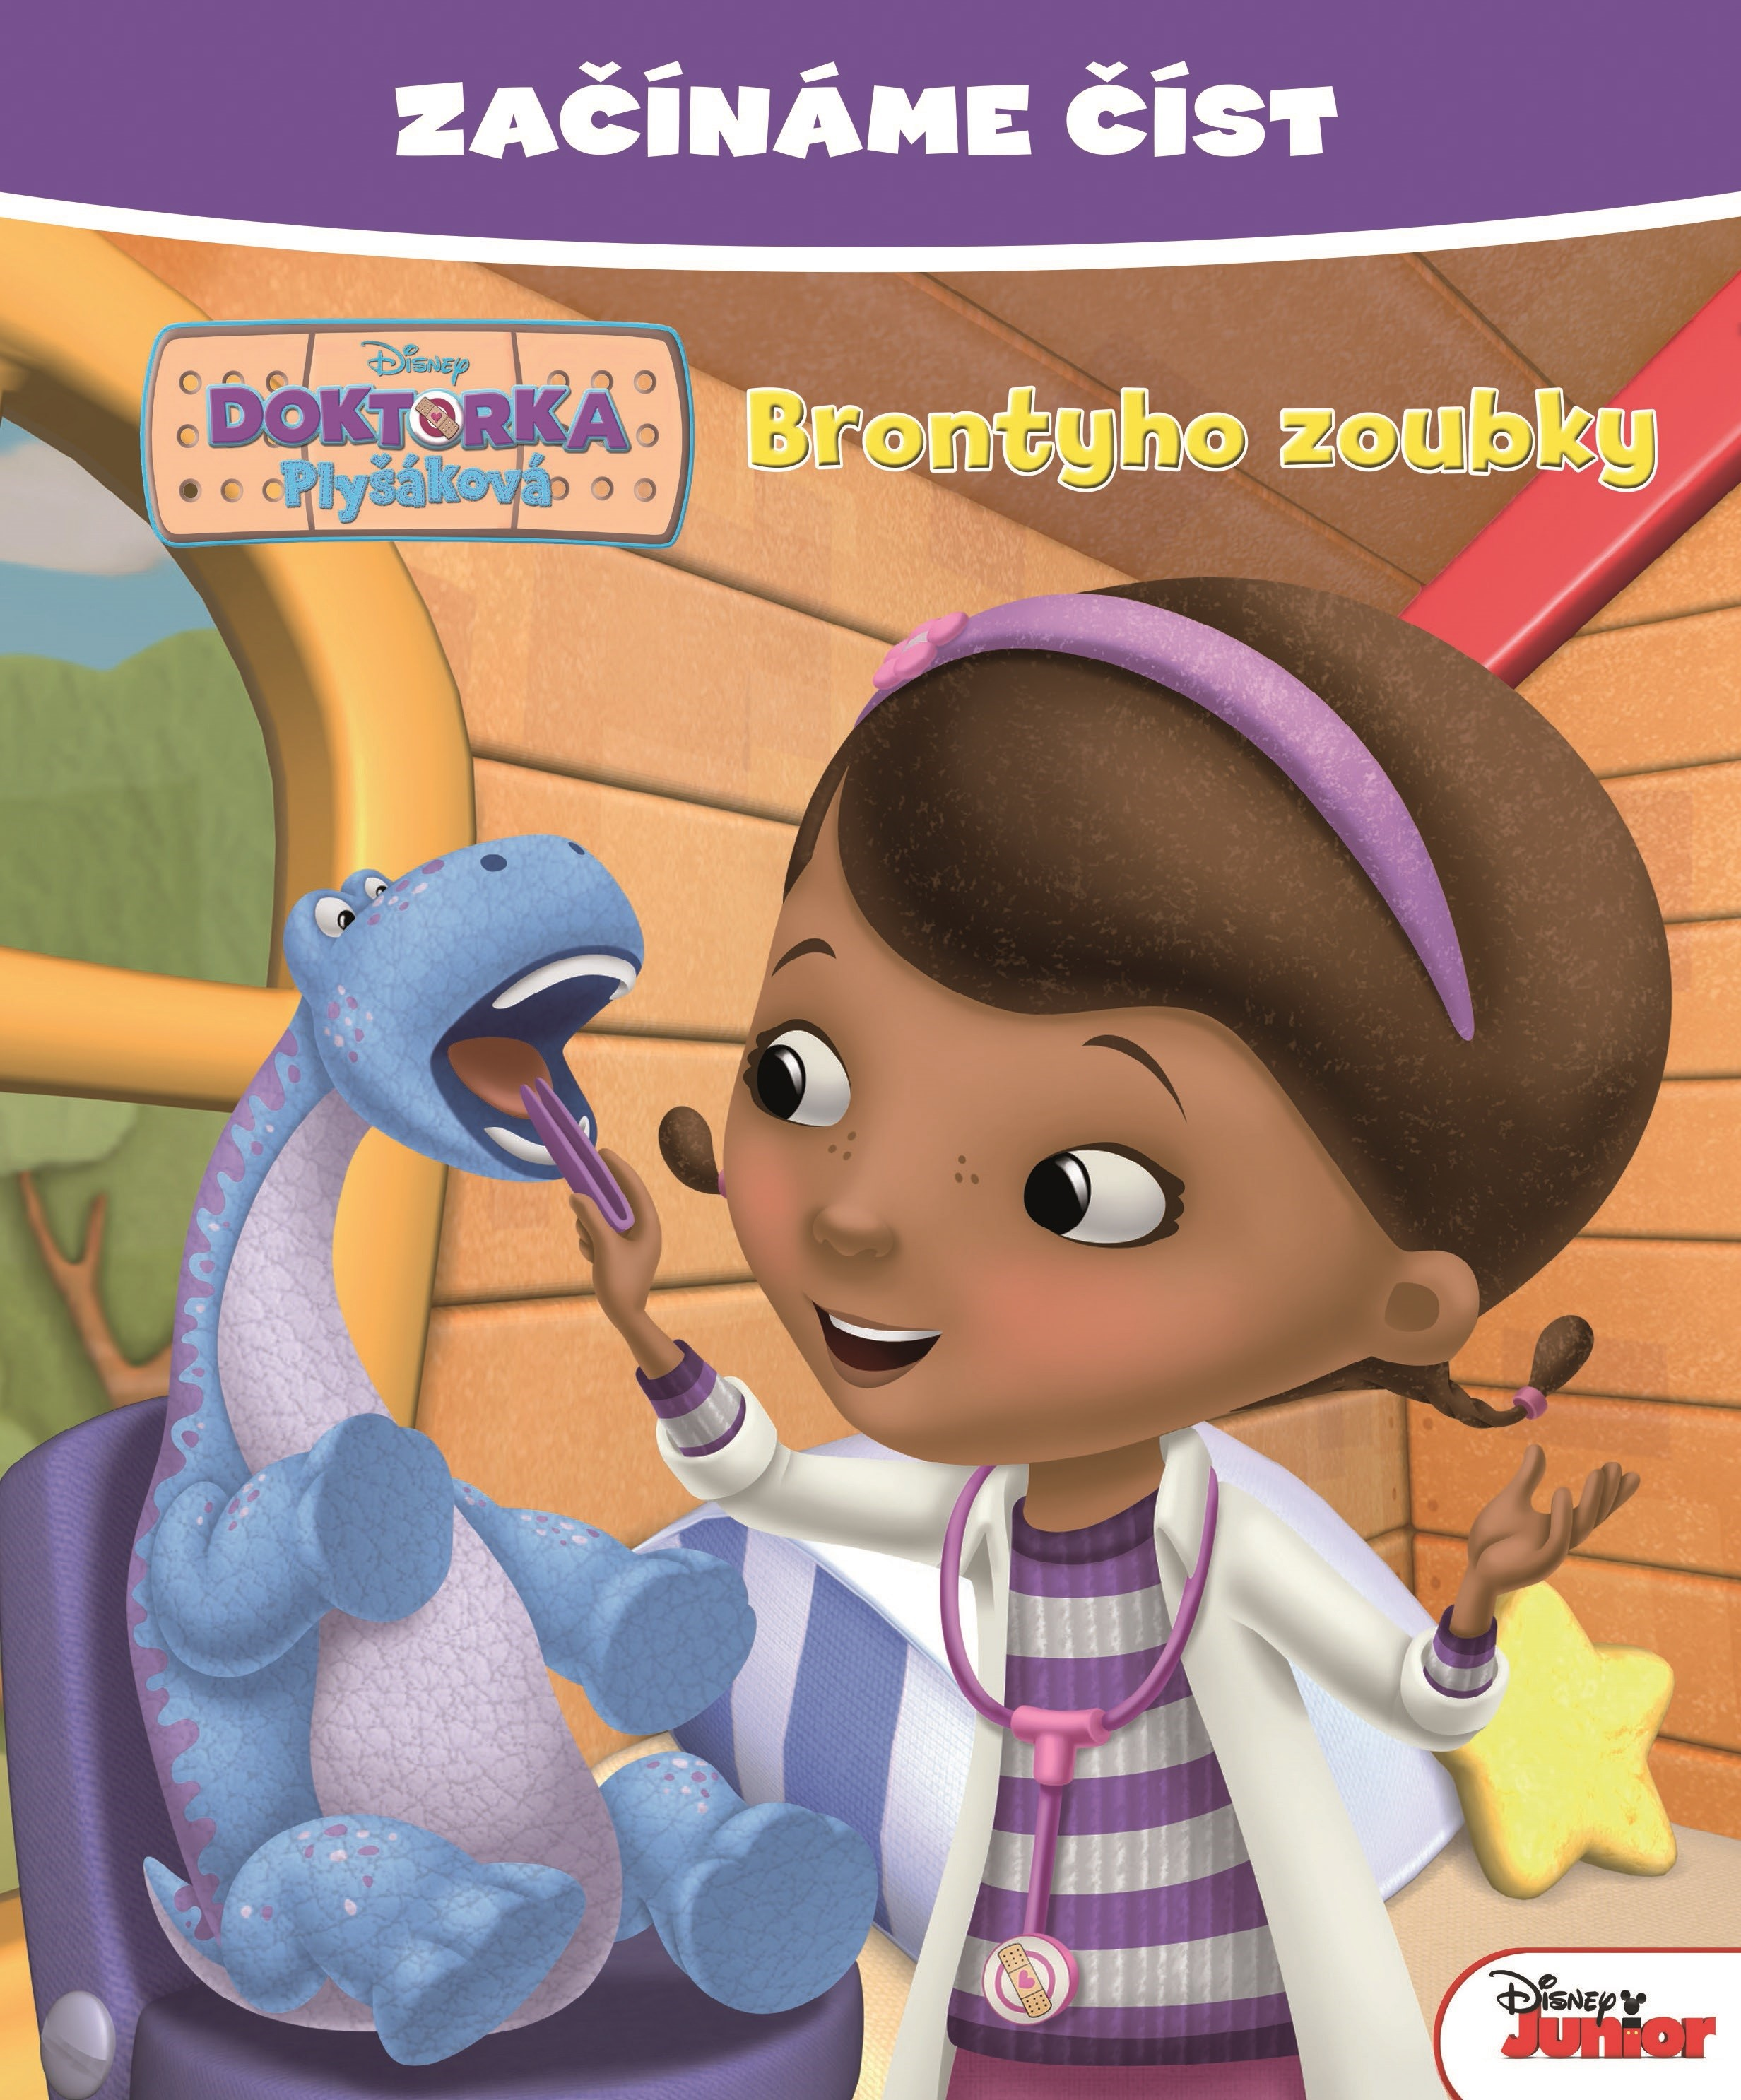 Začínáme číst - Doktorka Plyšáková - Brontyho zoubky | Walt Disney, Walt Disney